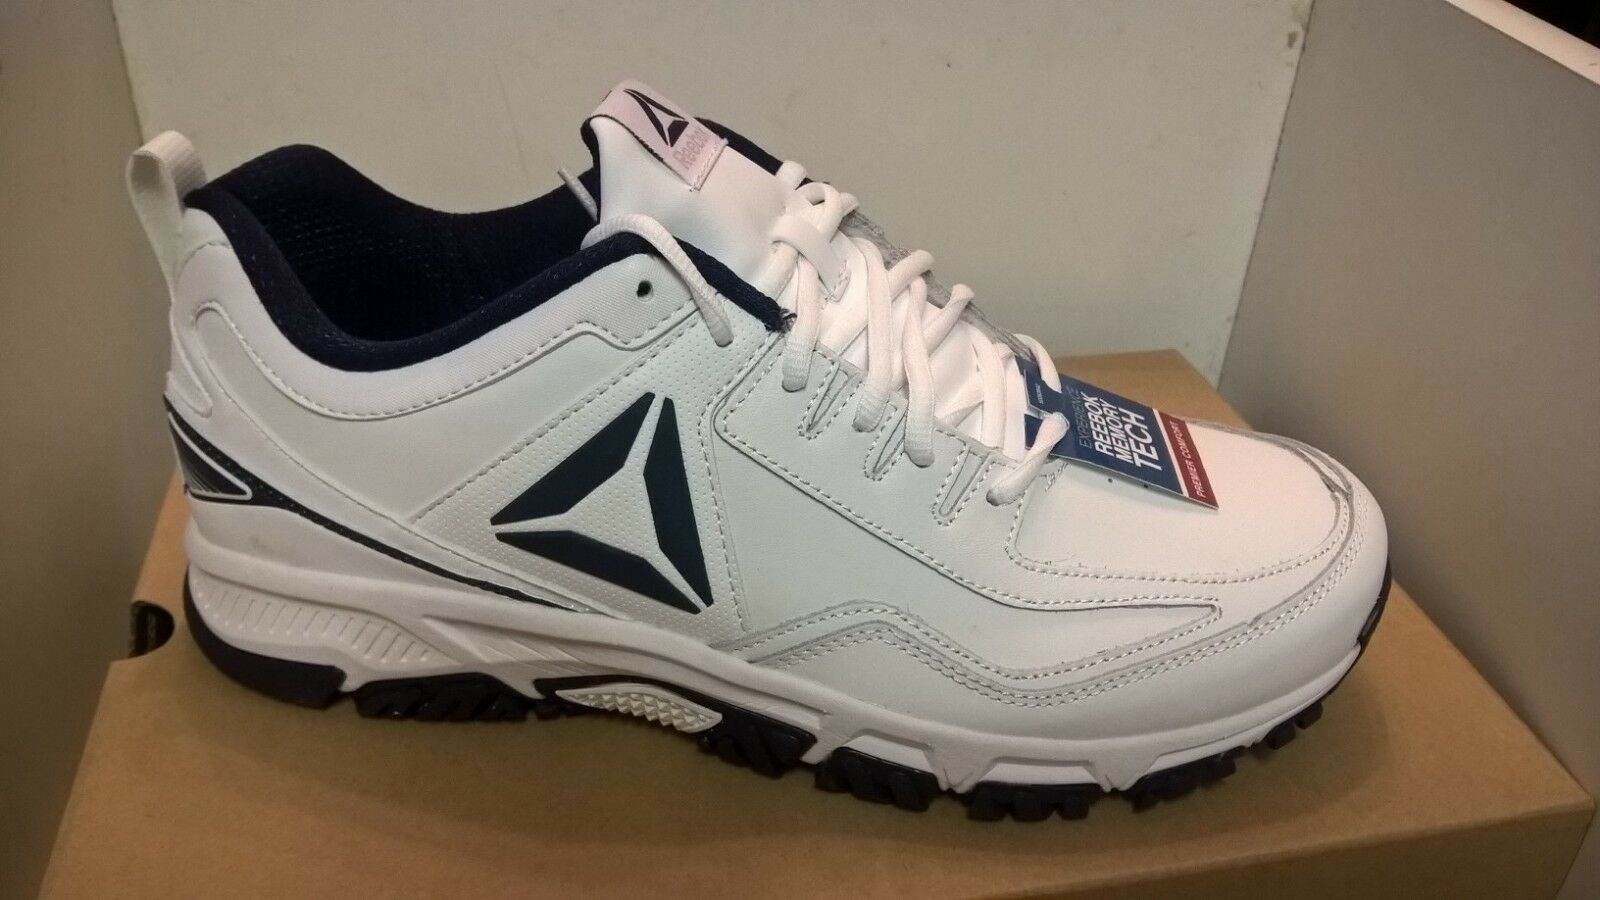 New Reebok Men's Ridge rider Athletic shoes  Memory foam Extra Wide 4E